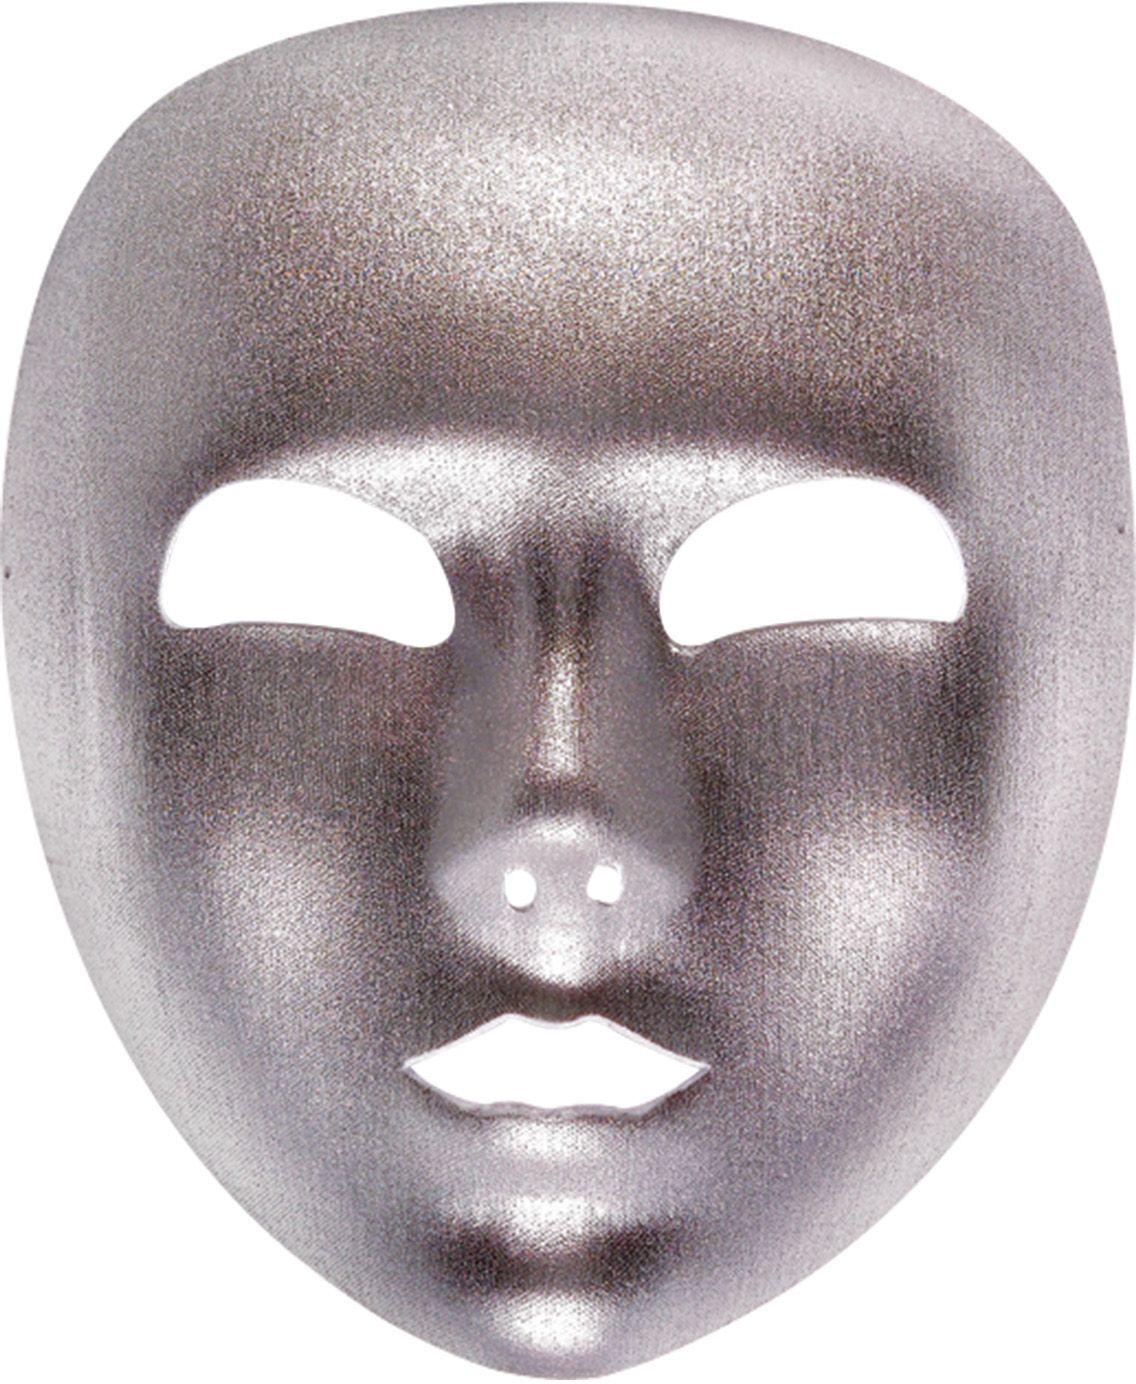 Zilveren standaard masker